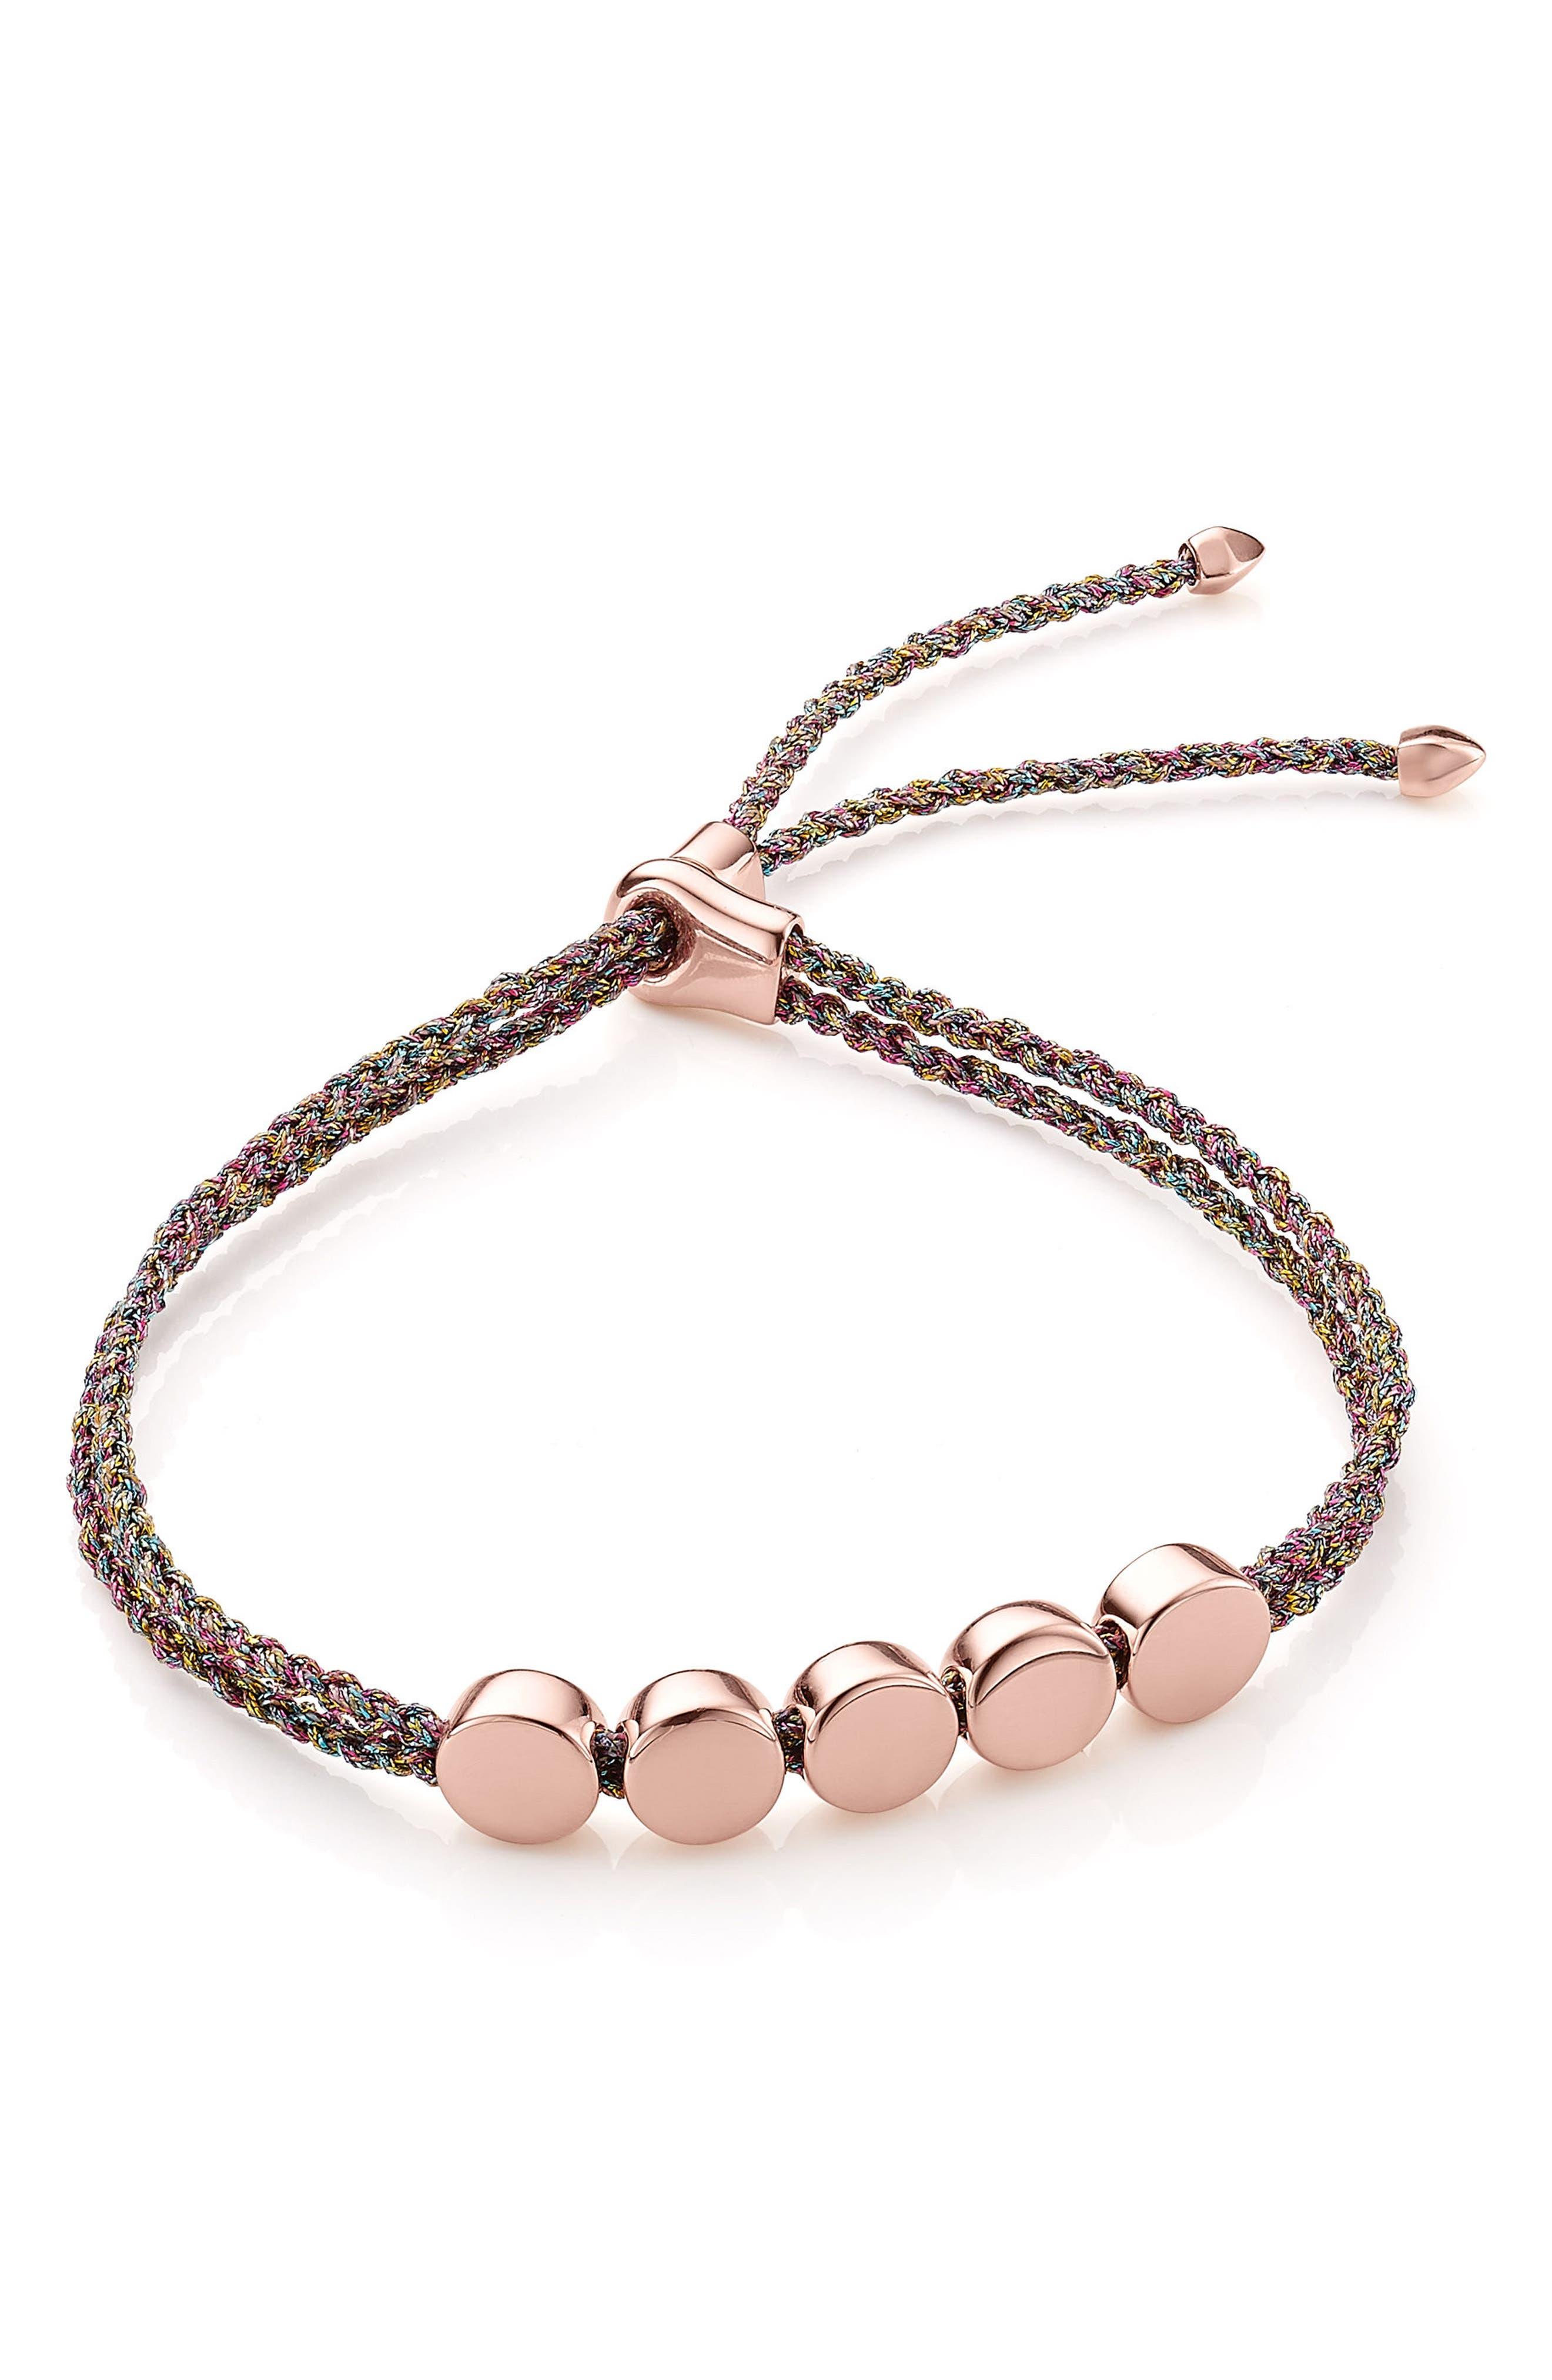 Linear Bead Friendship Bracelet,                         Main,                         color, Rose Gold/ Rainbow